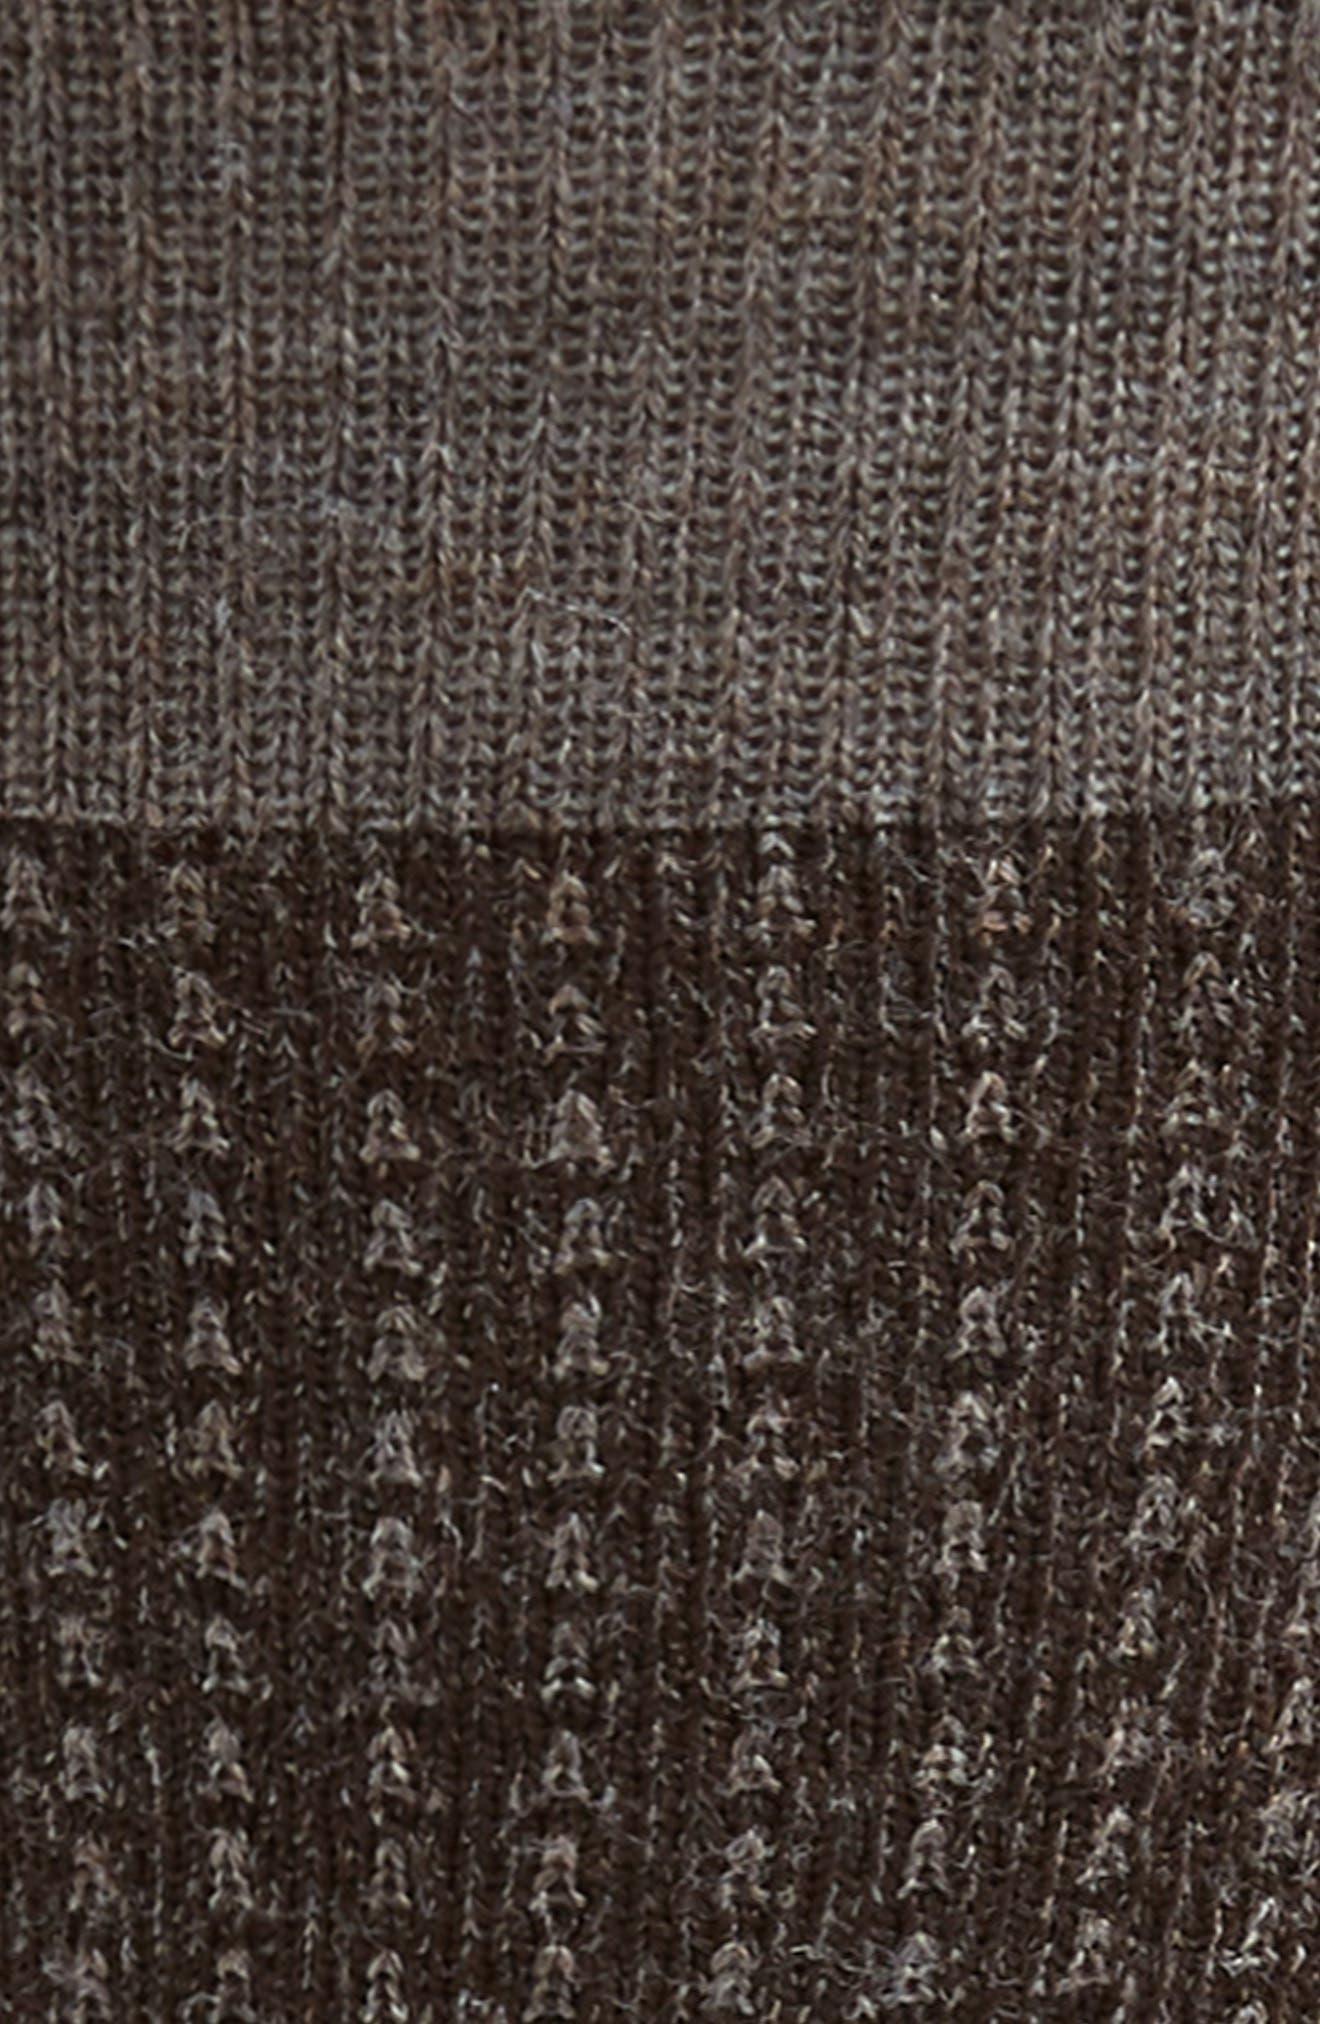 Premium East Gate Socks,                             Alternate thumbnail 2, color,                             TAUPE HEATHER